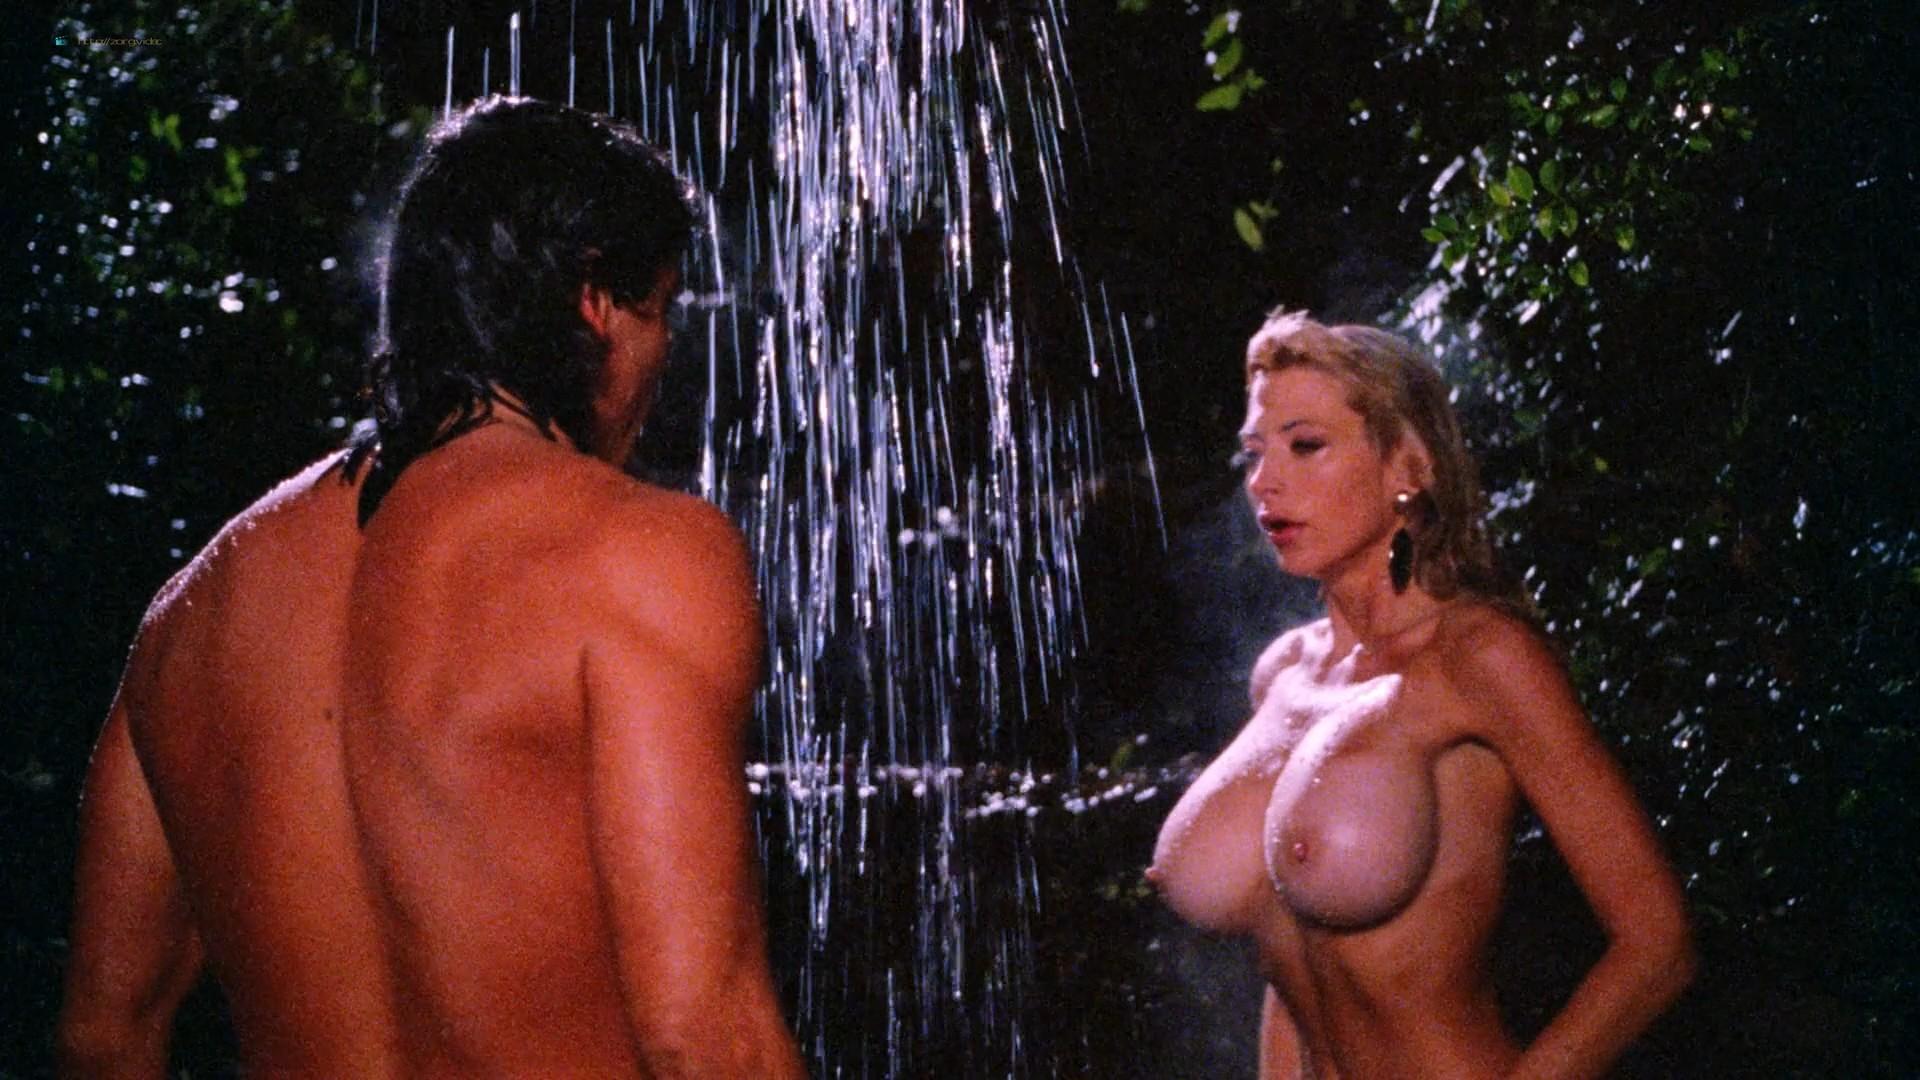 Dona Speir nude Pandora Peaks, Carolyn Liu and others nude too - Do or Die (1991) 1080p BluRay (7)